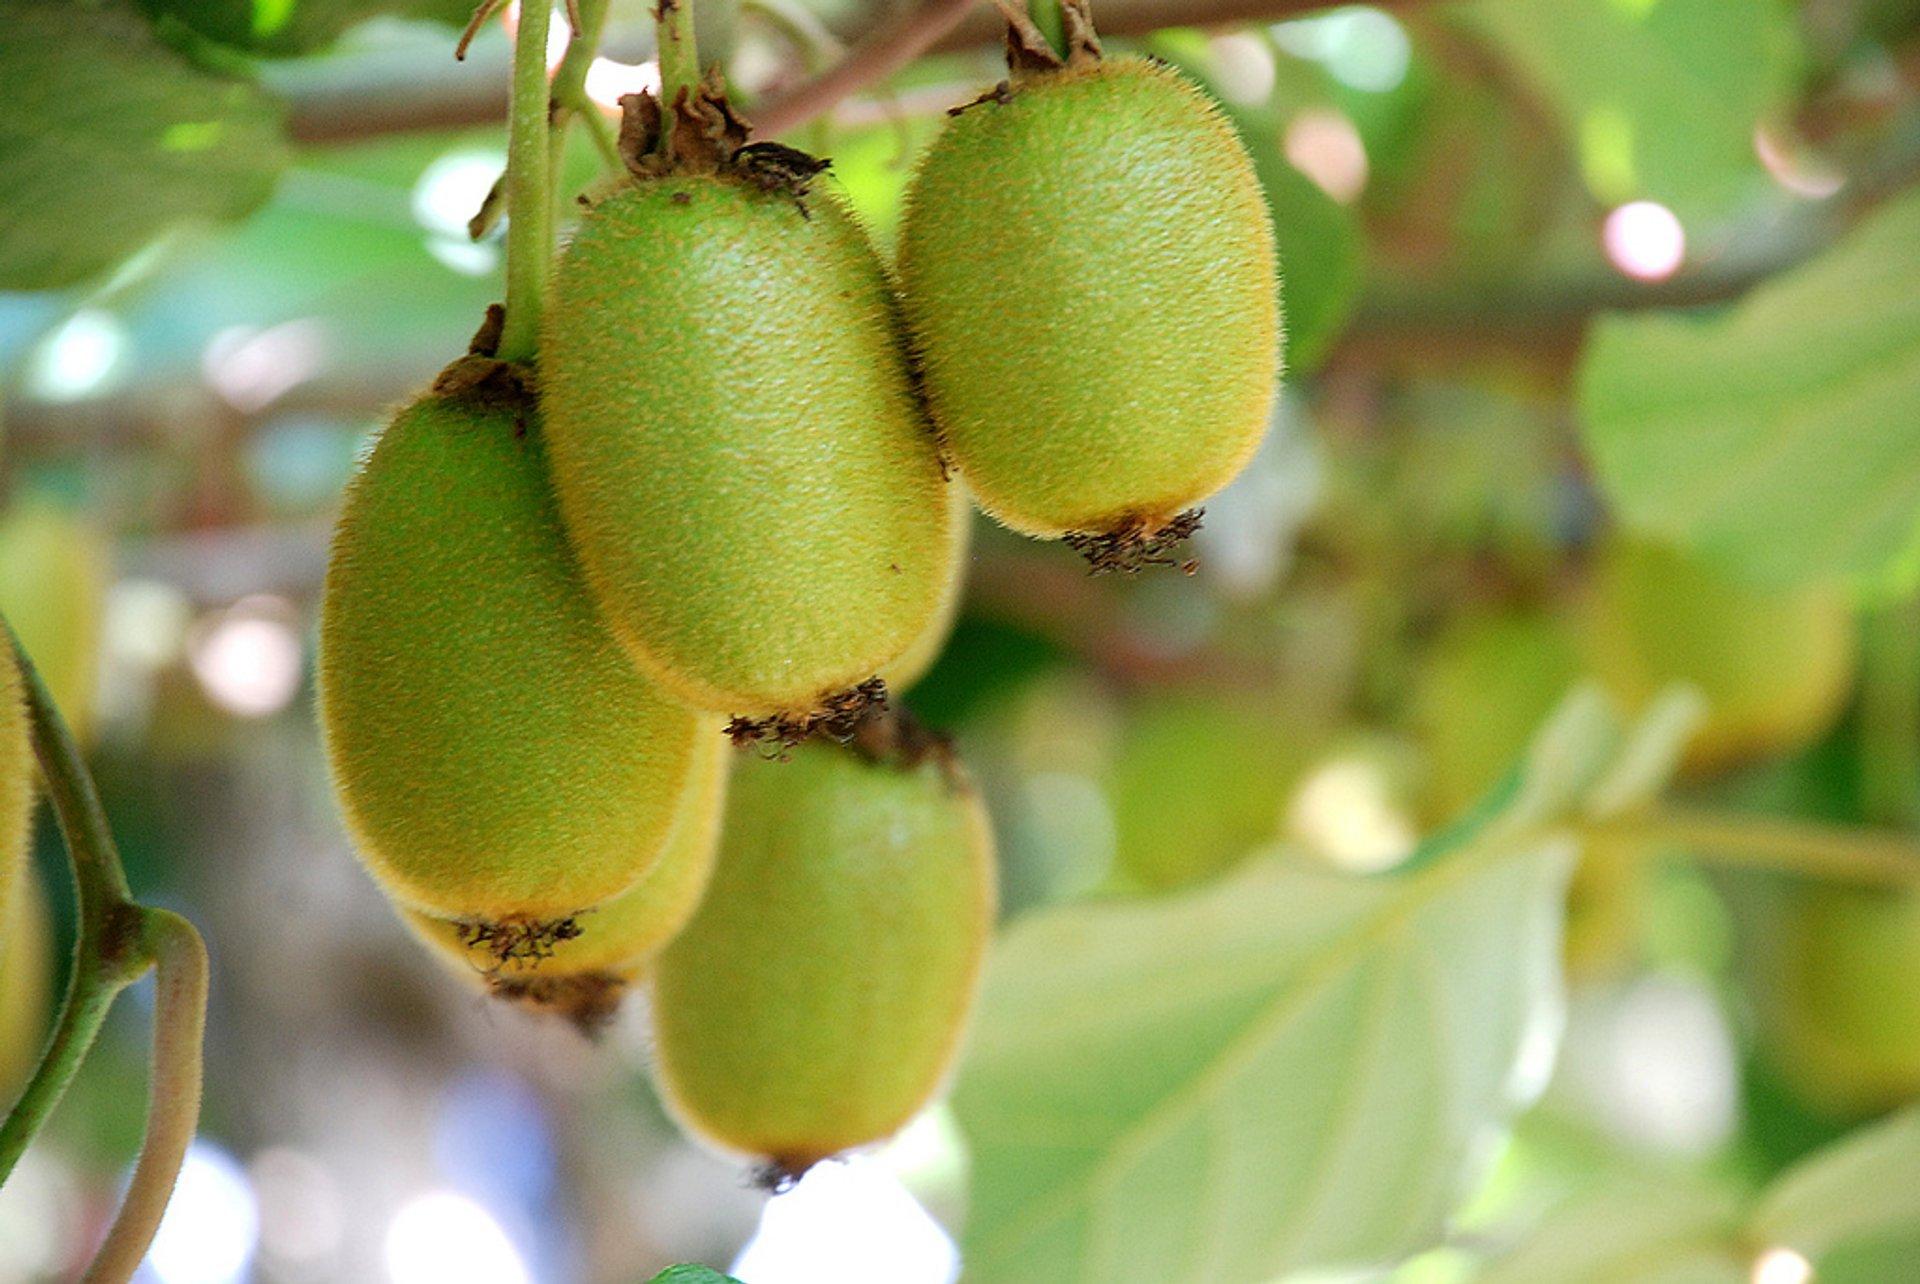 Golden Kiwifruit in New Zealand - Best Time